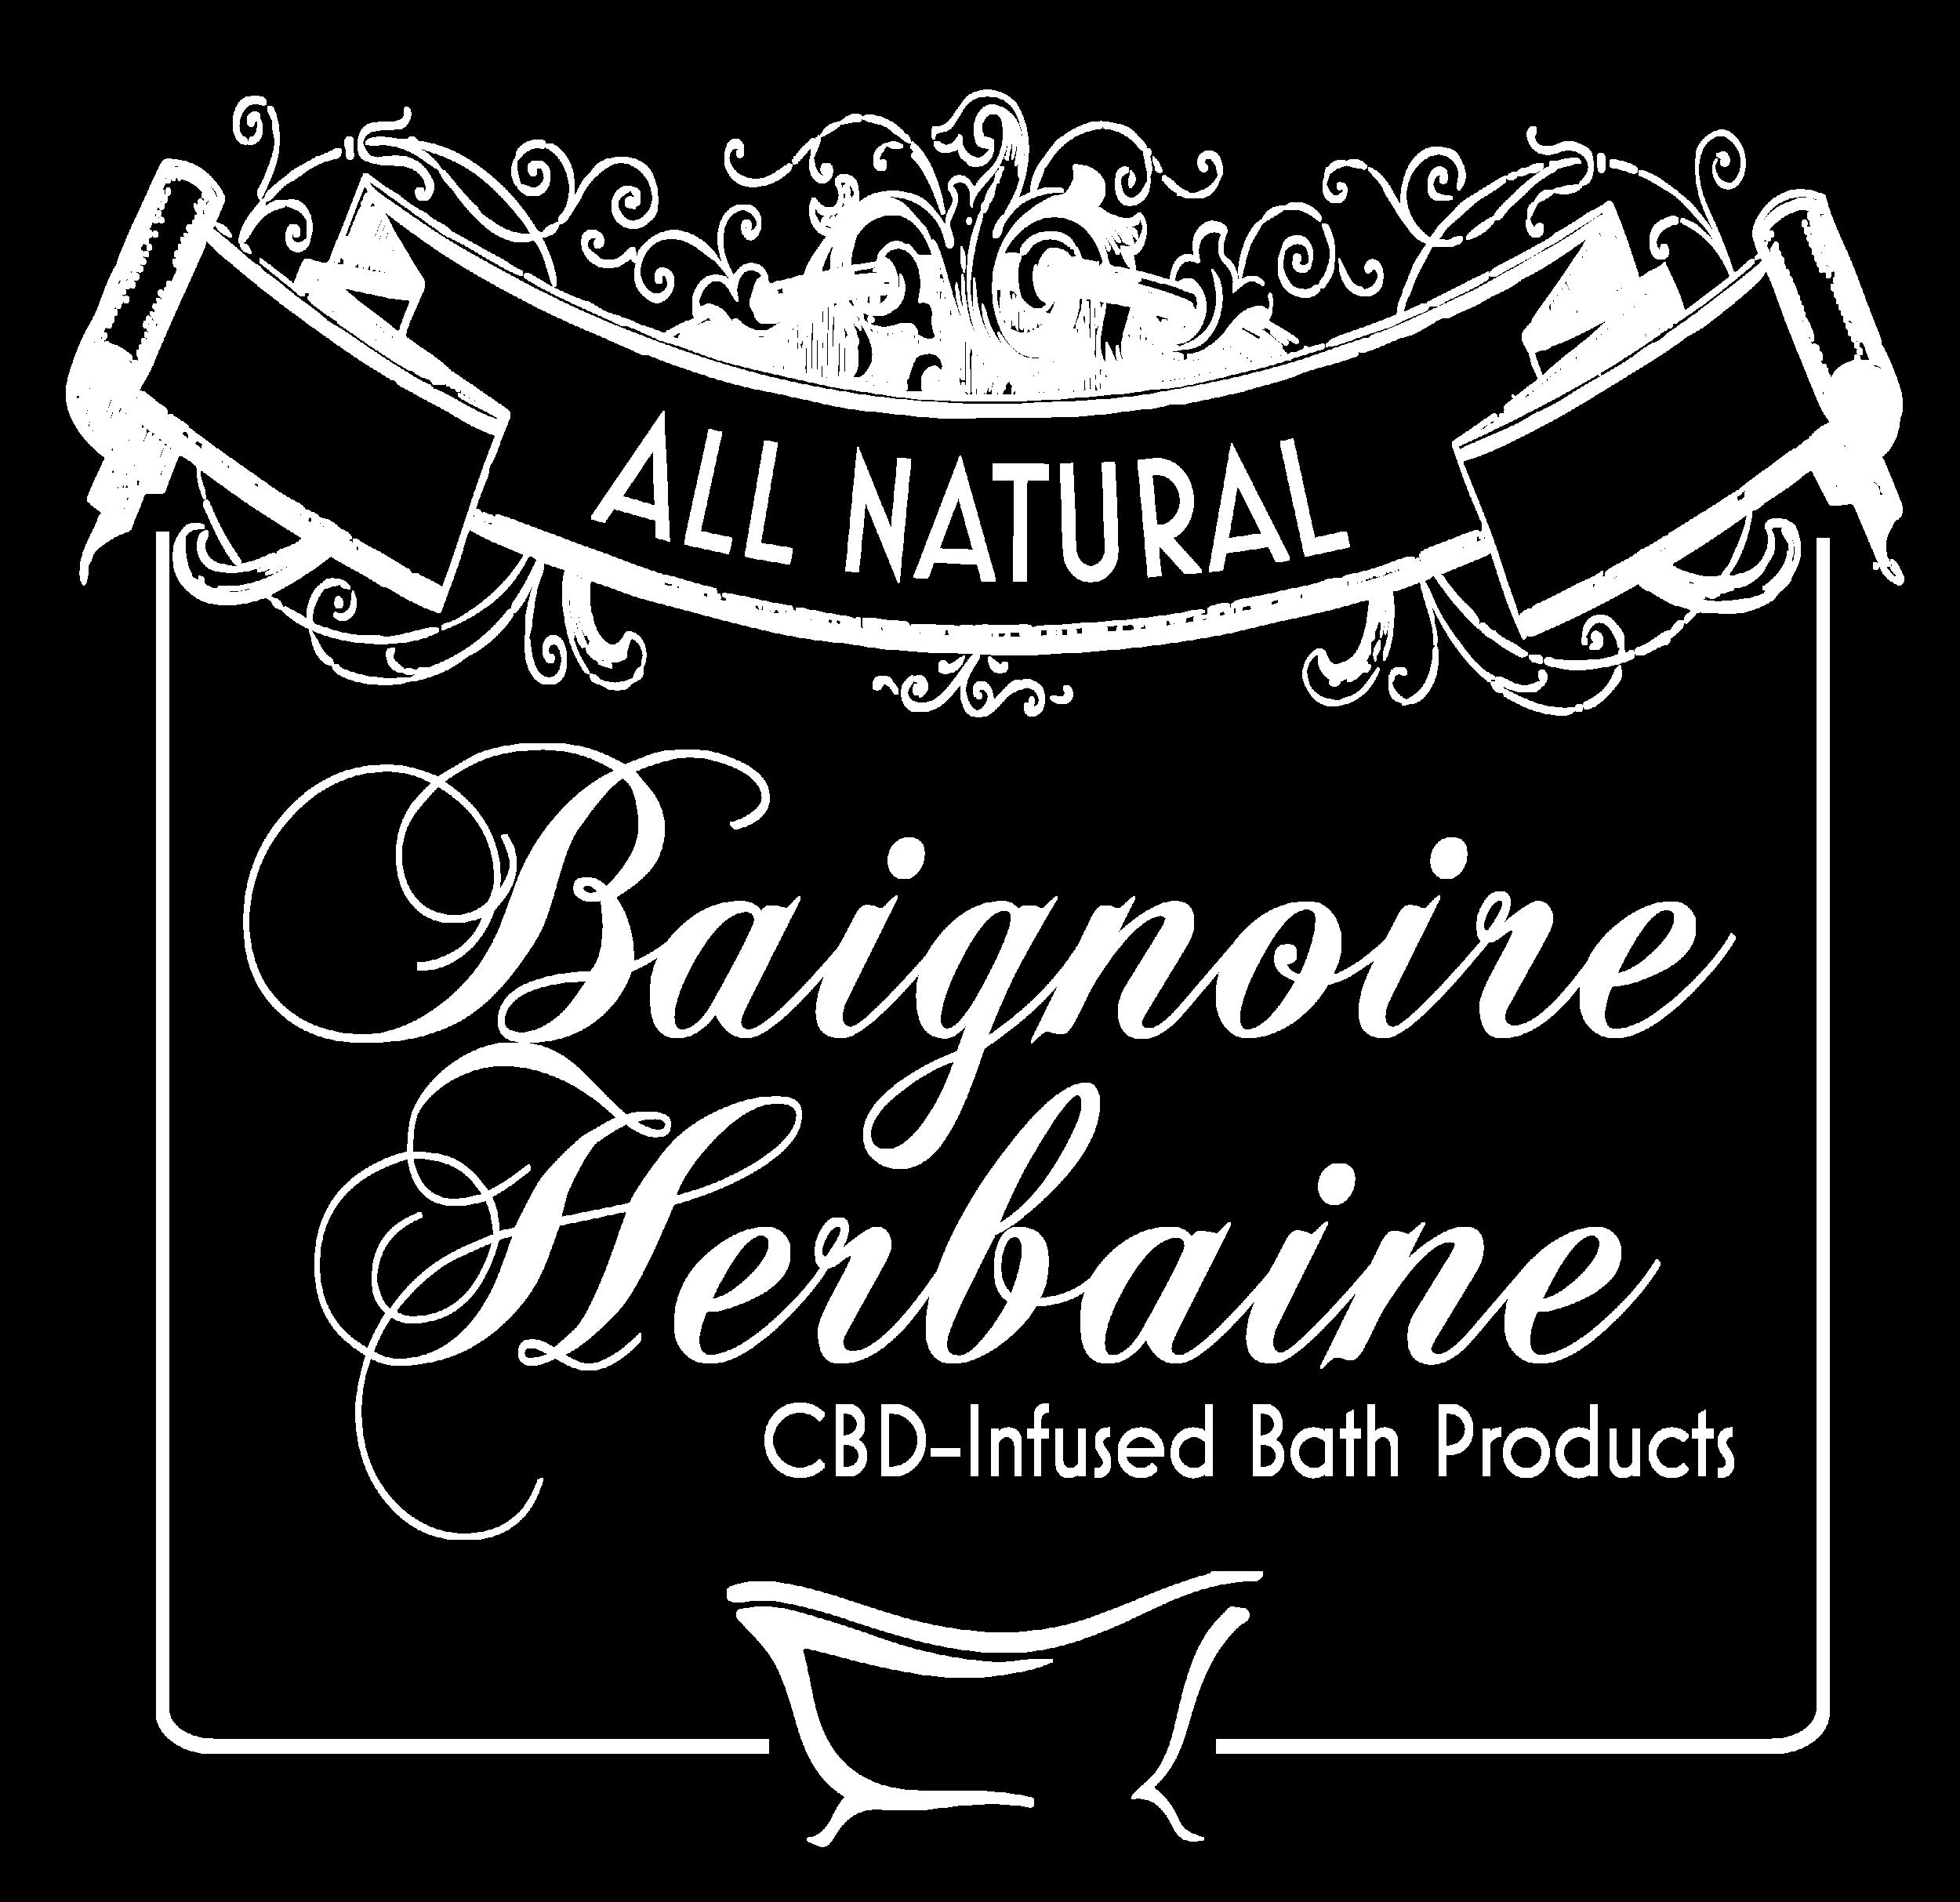 BAIGNOIRE HERBAINE WHITE LOGO TRANSPARENT BG-01.png